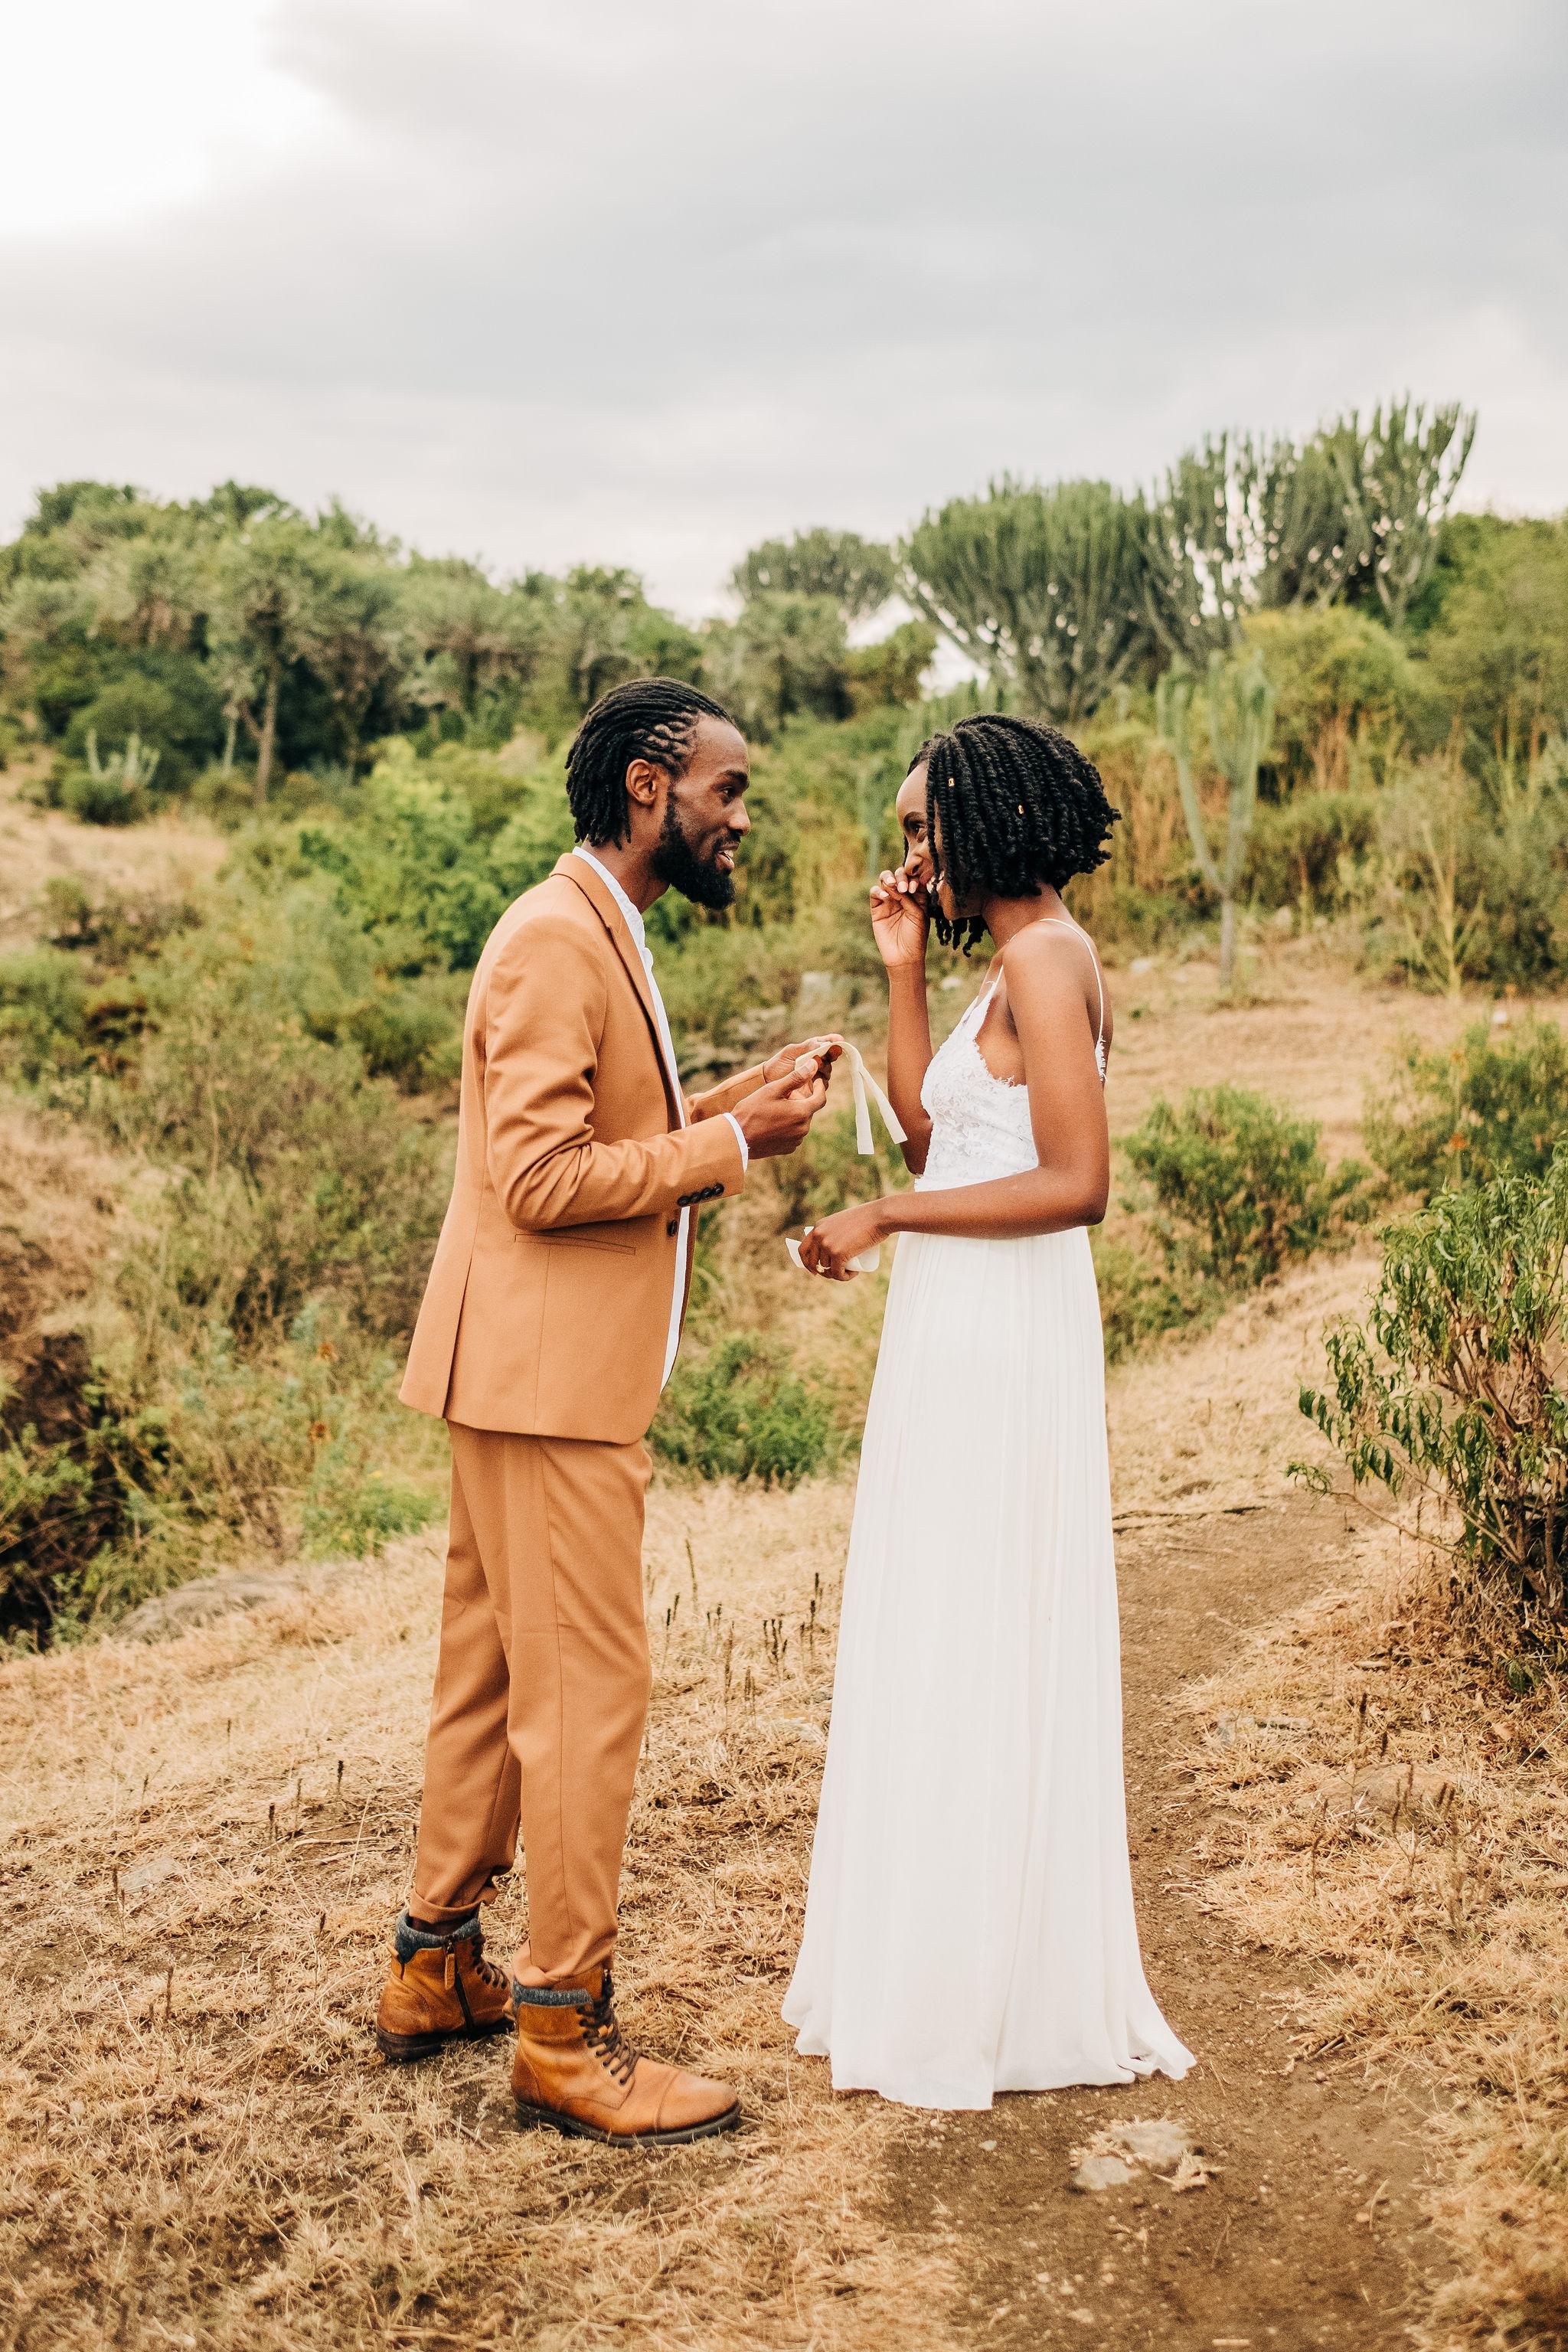 Anna-Hari-Photography-Destination-Wedding-Photographer-Kenya-142.jpg